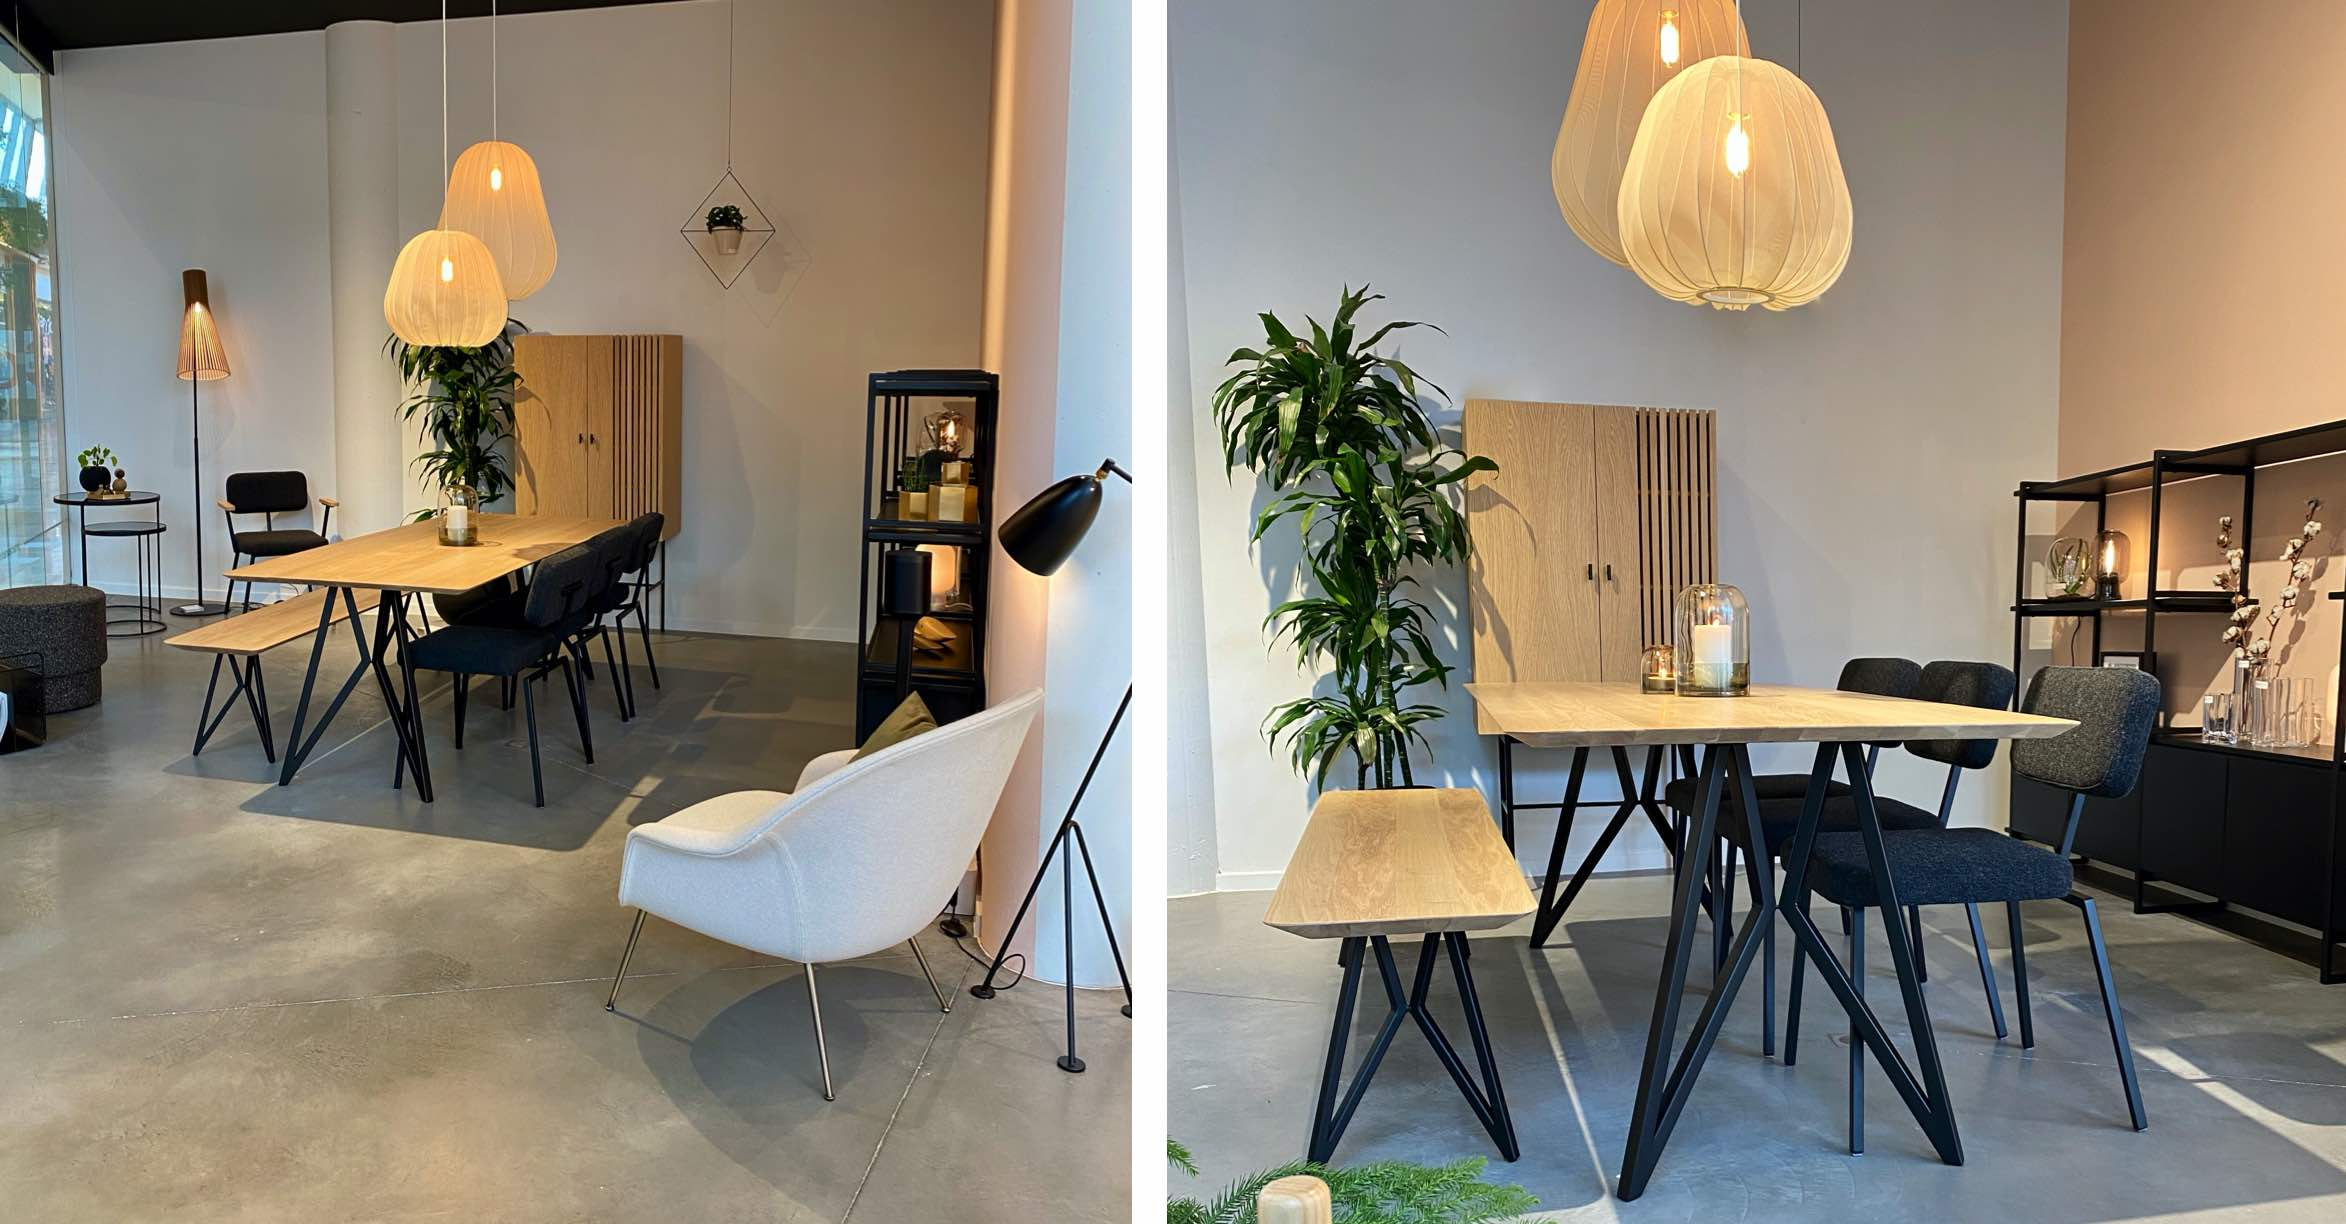 Studio Henk Ninove